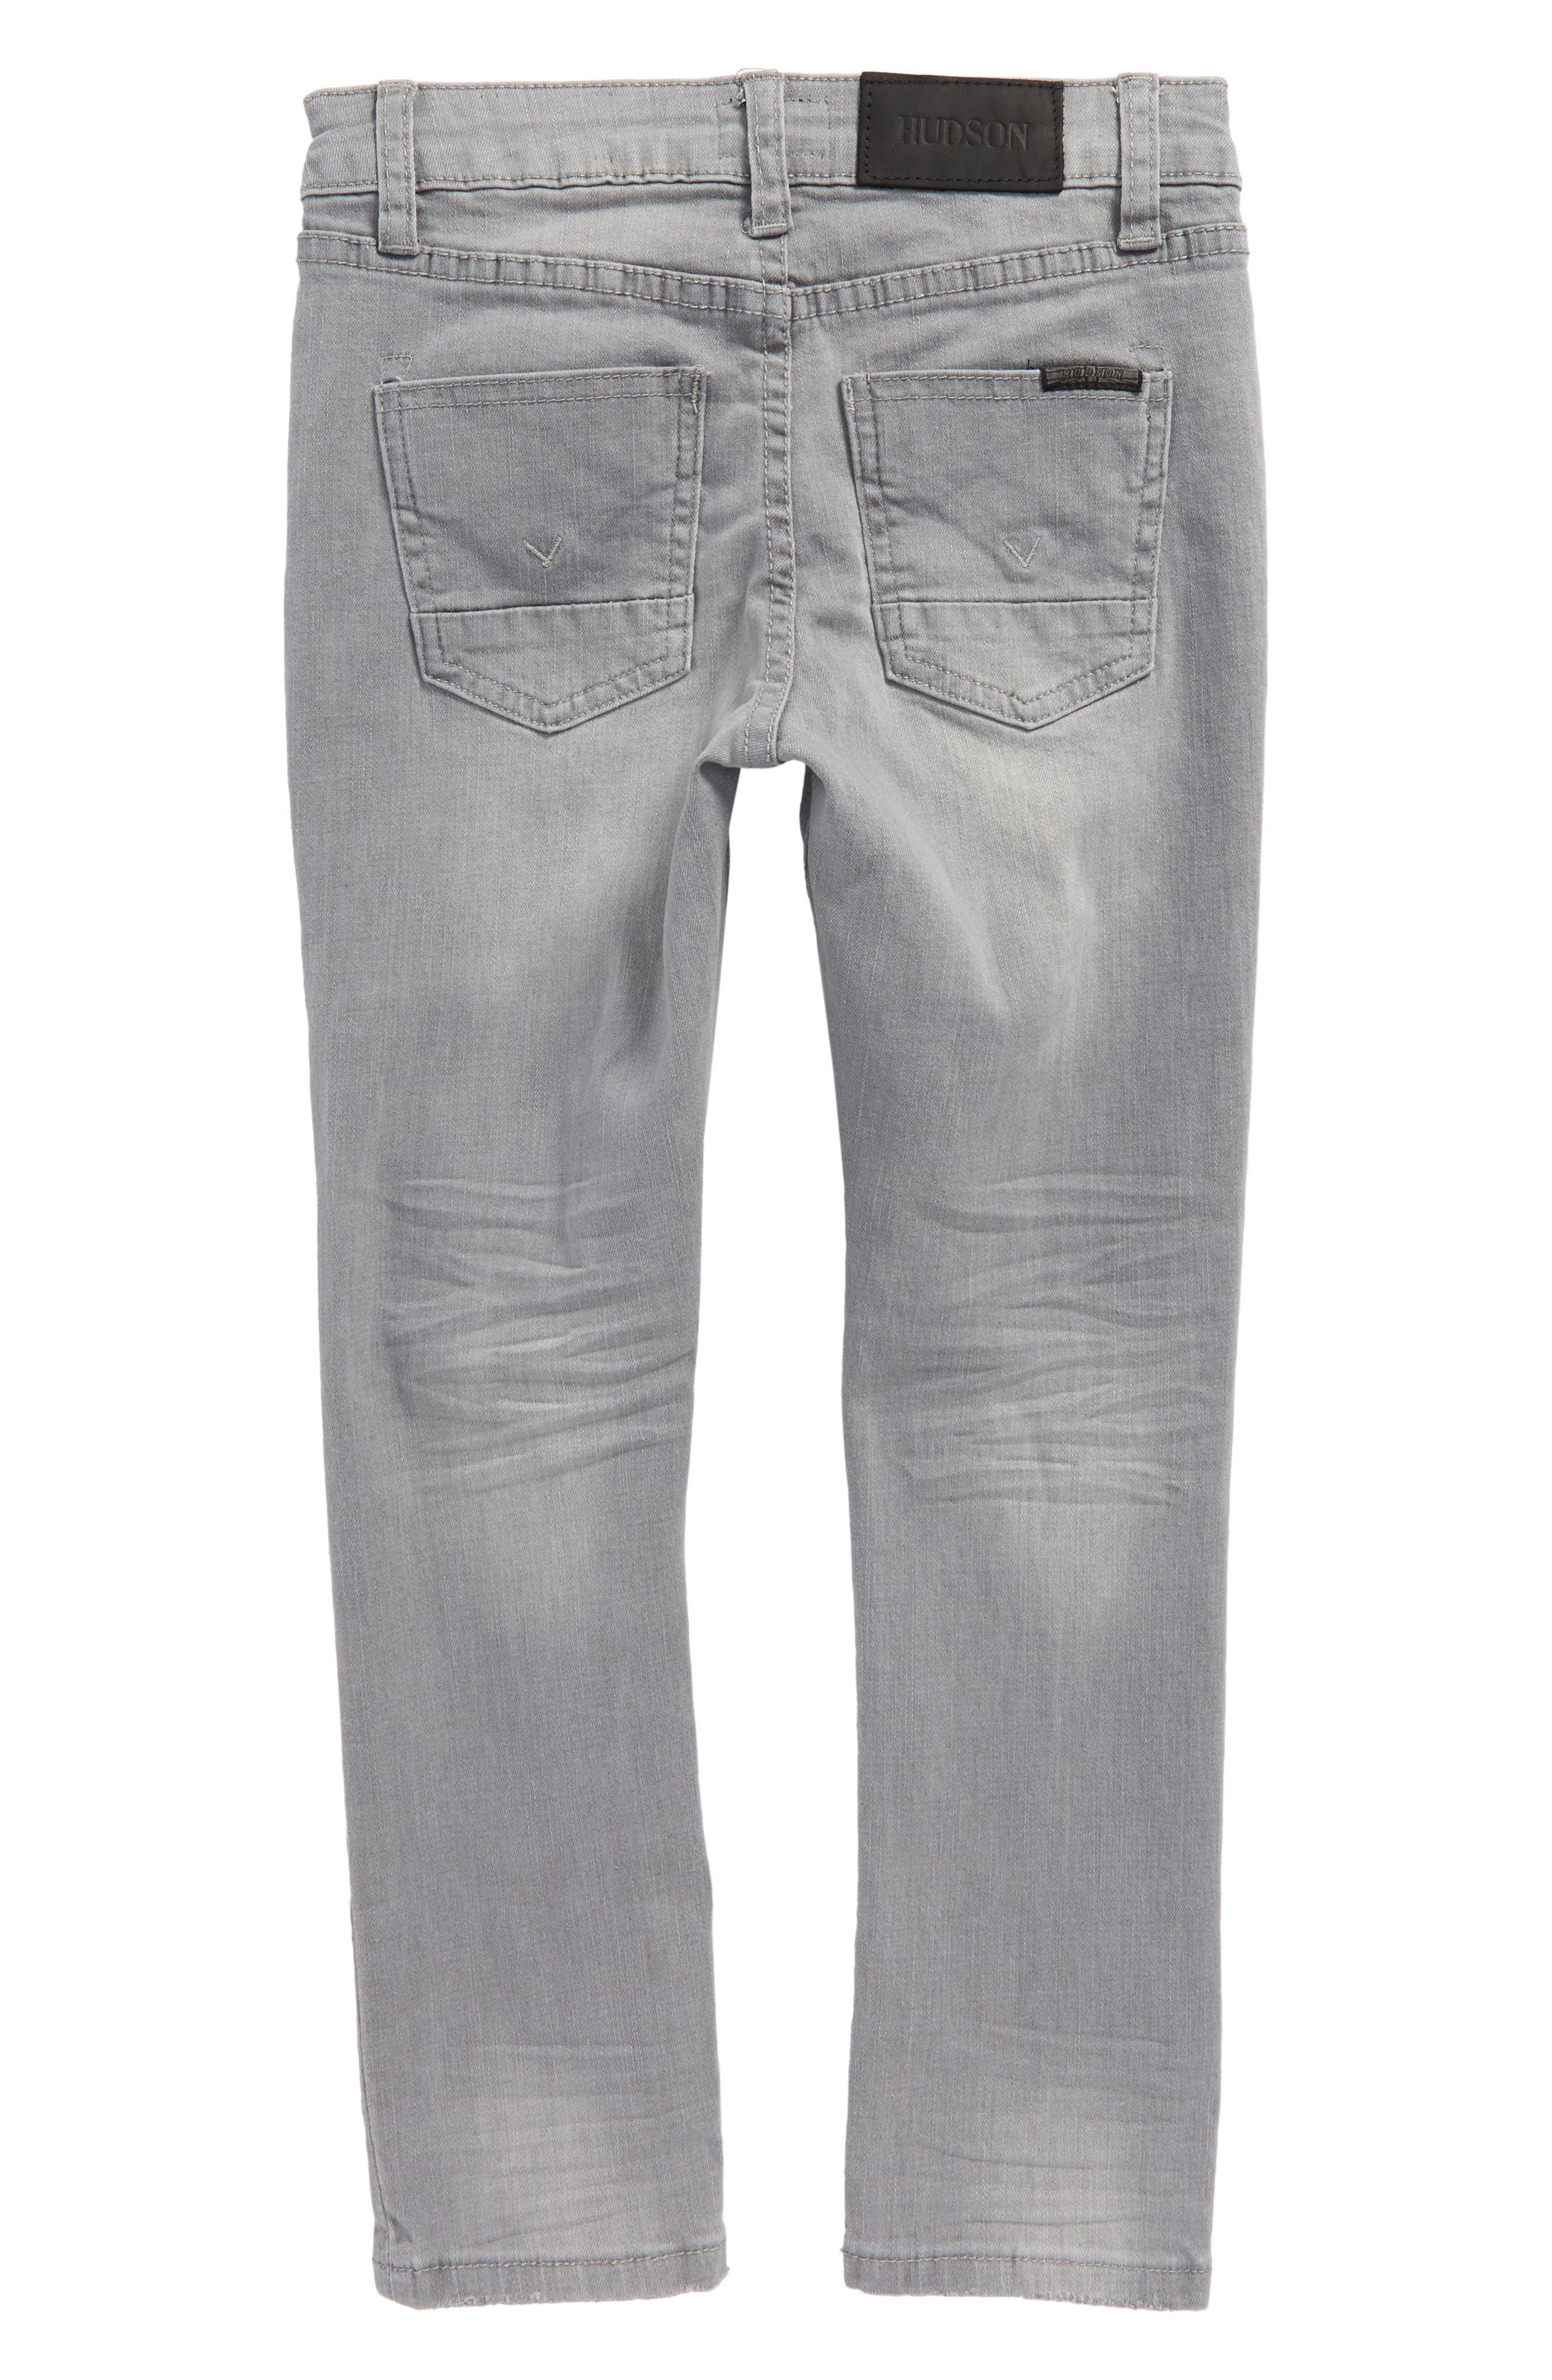 Jude Slim Fit Skinny Jeans,                             Alternate thumbnail 2, color,                             Ice Grey